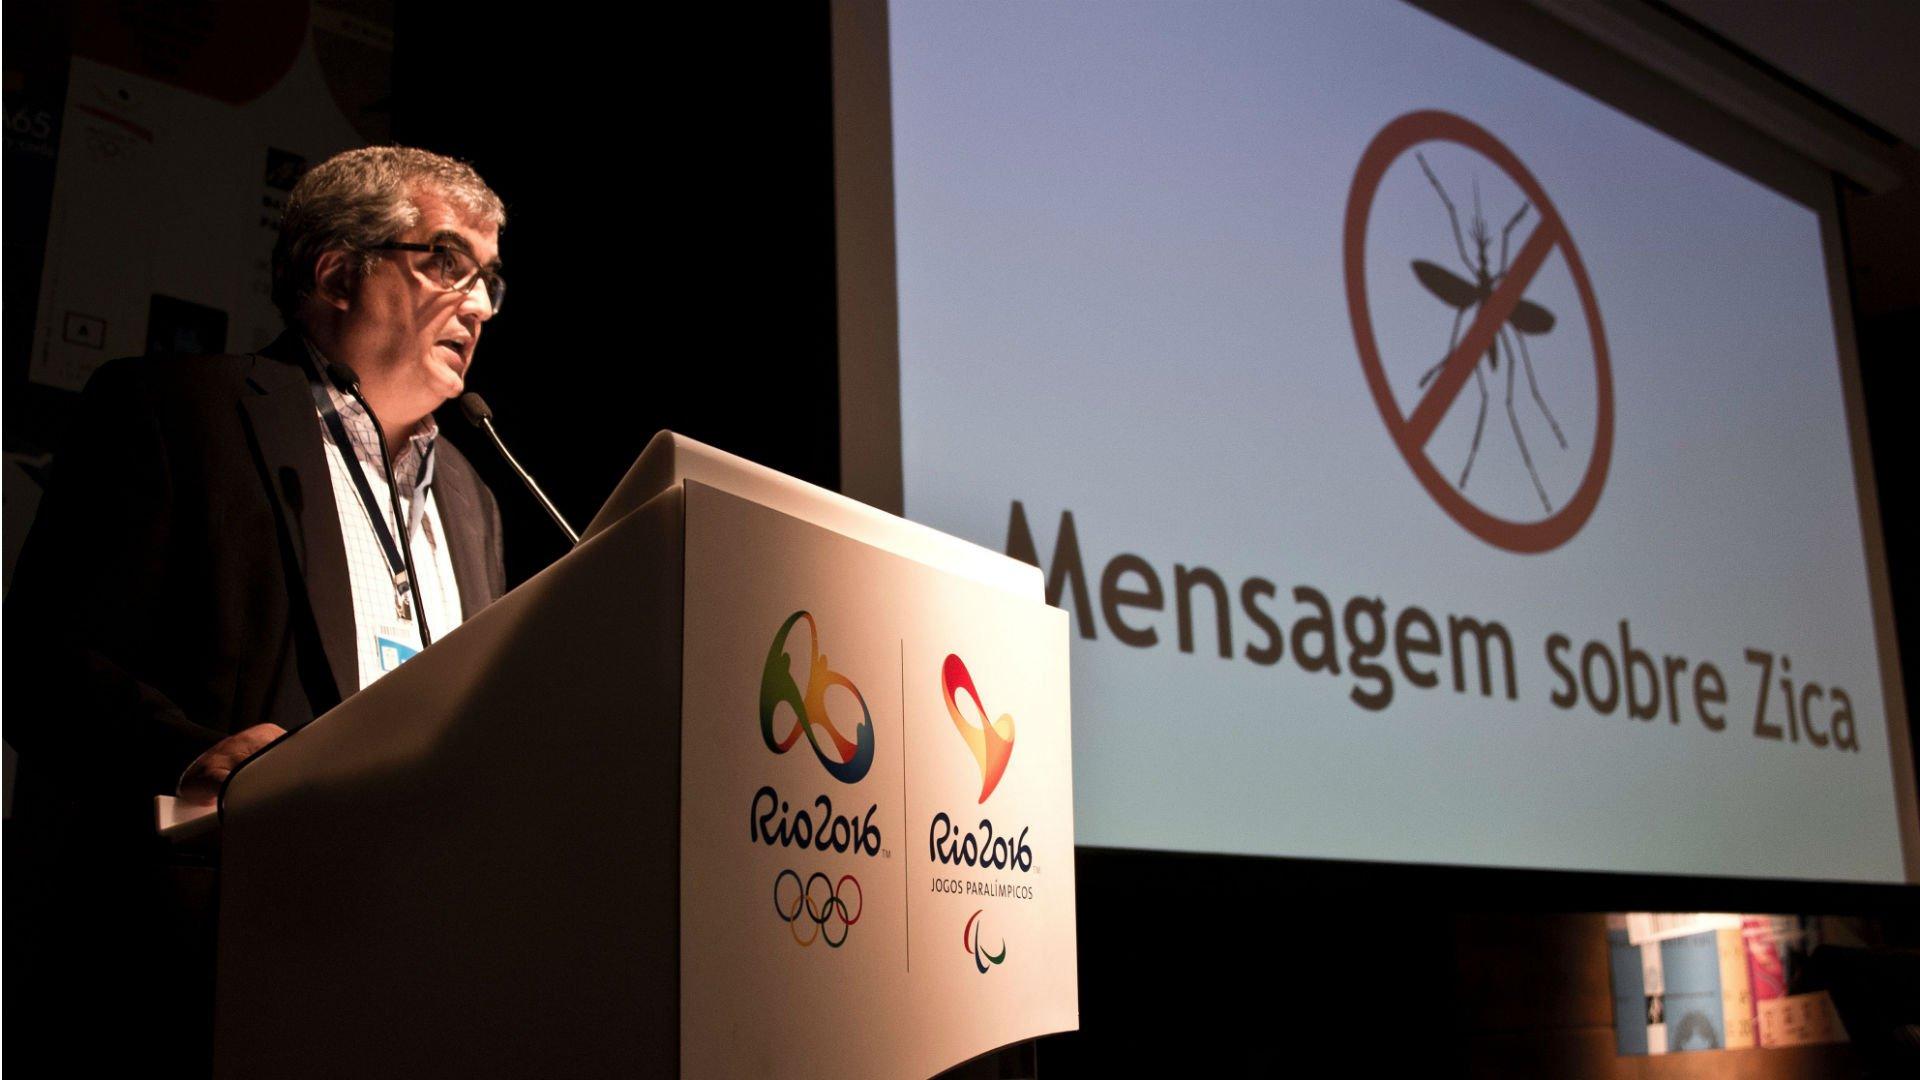 Врачи просят перенести Рио-2016 из-за вируса Зика